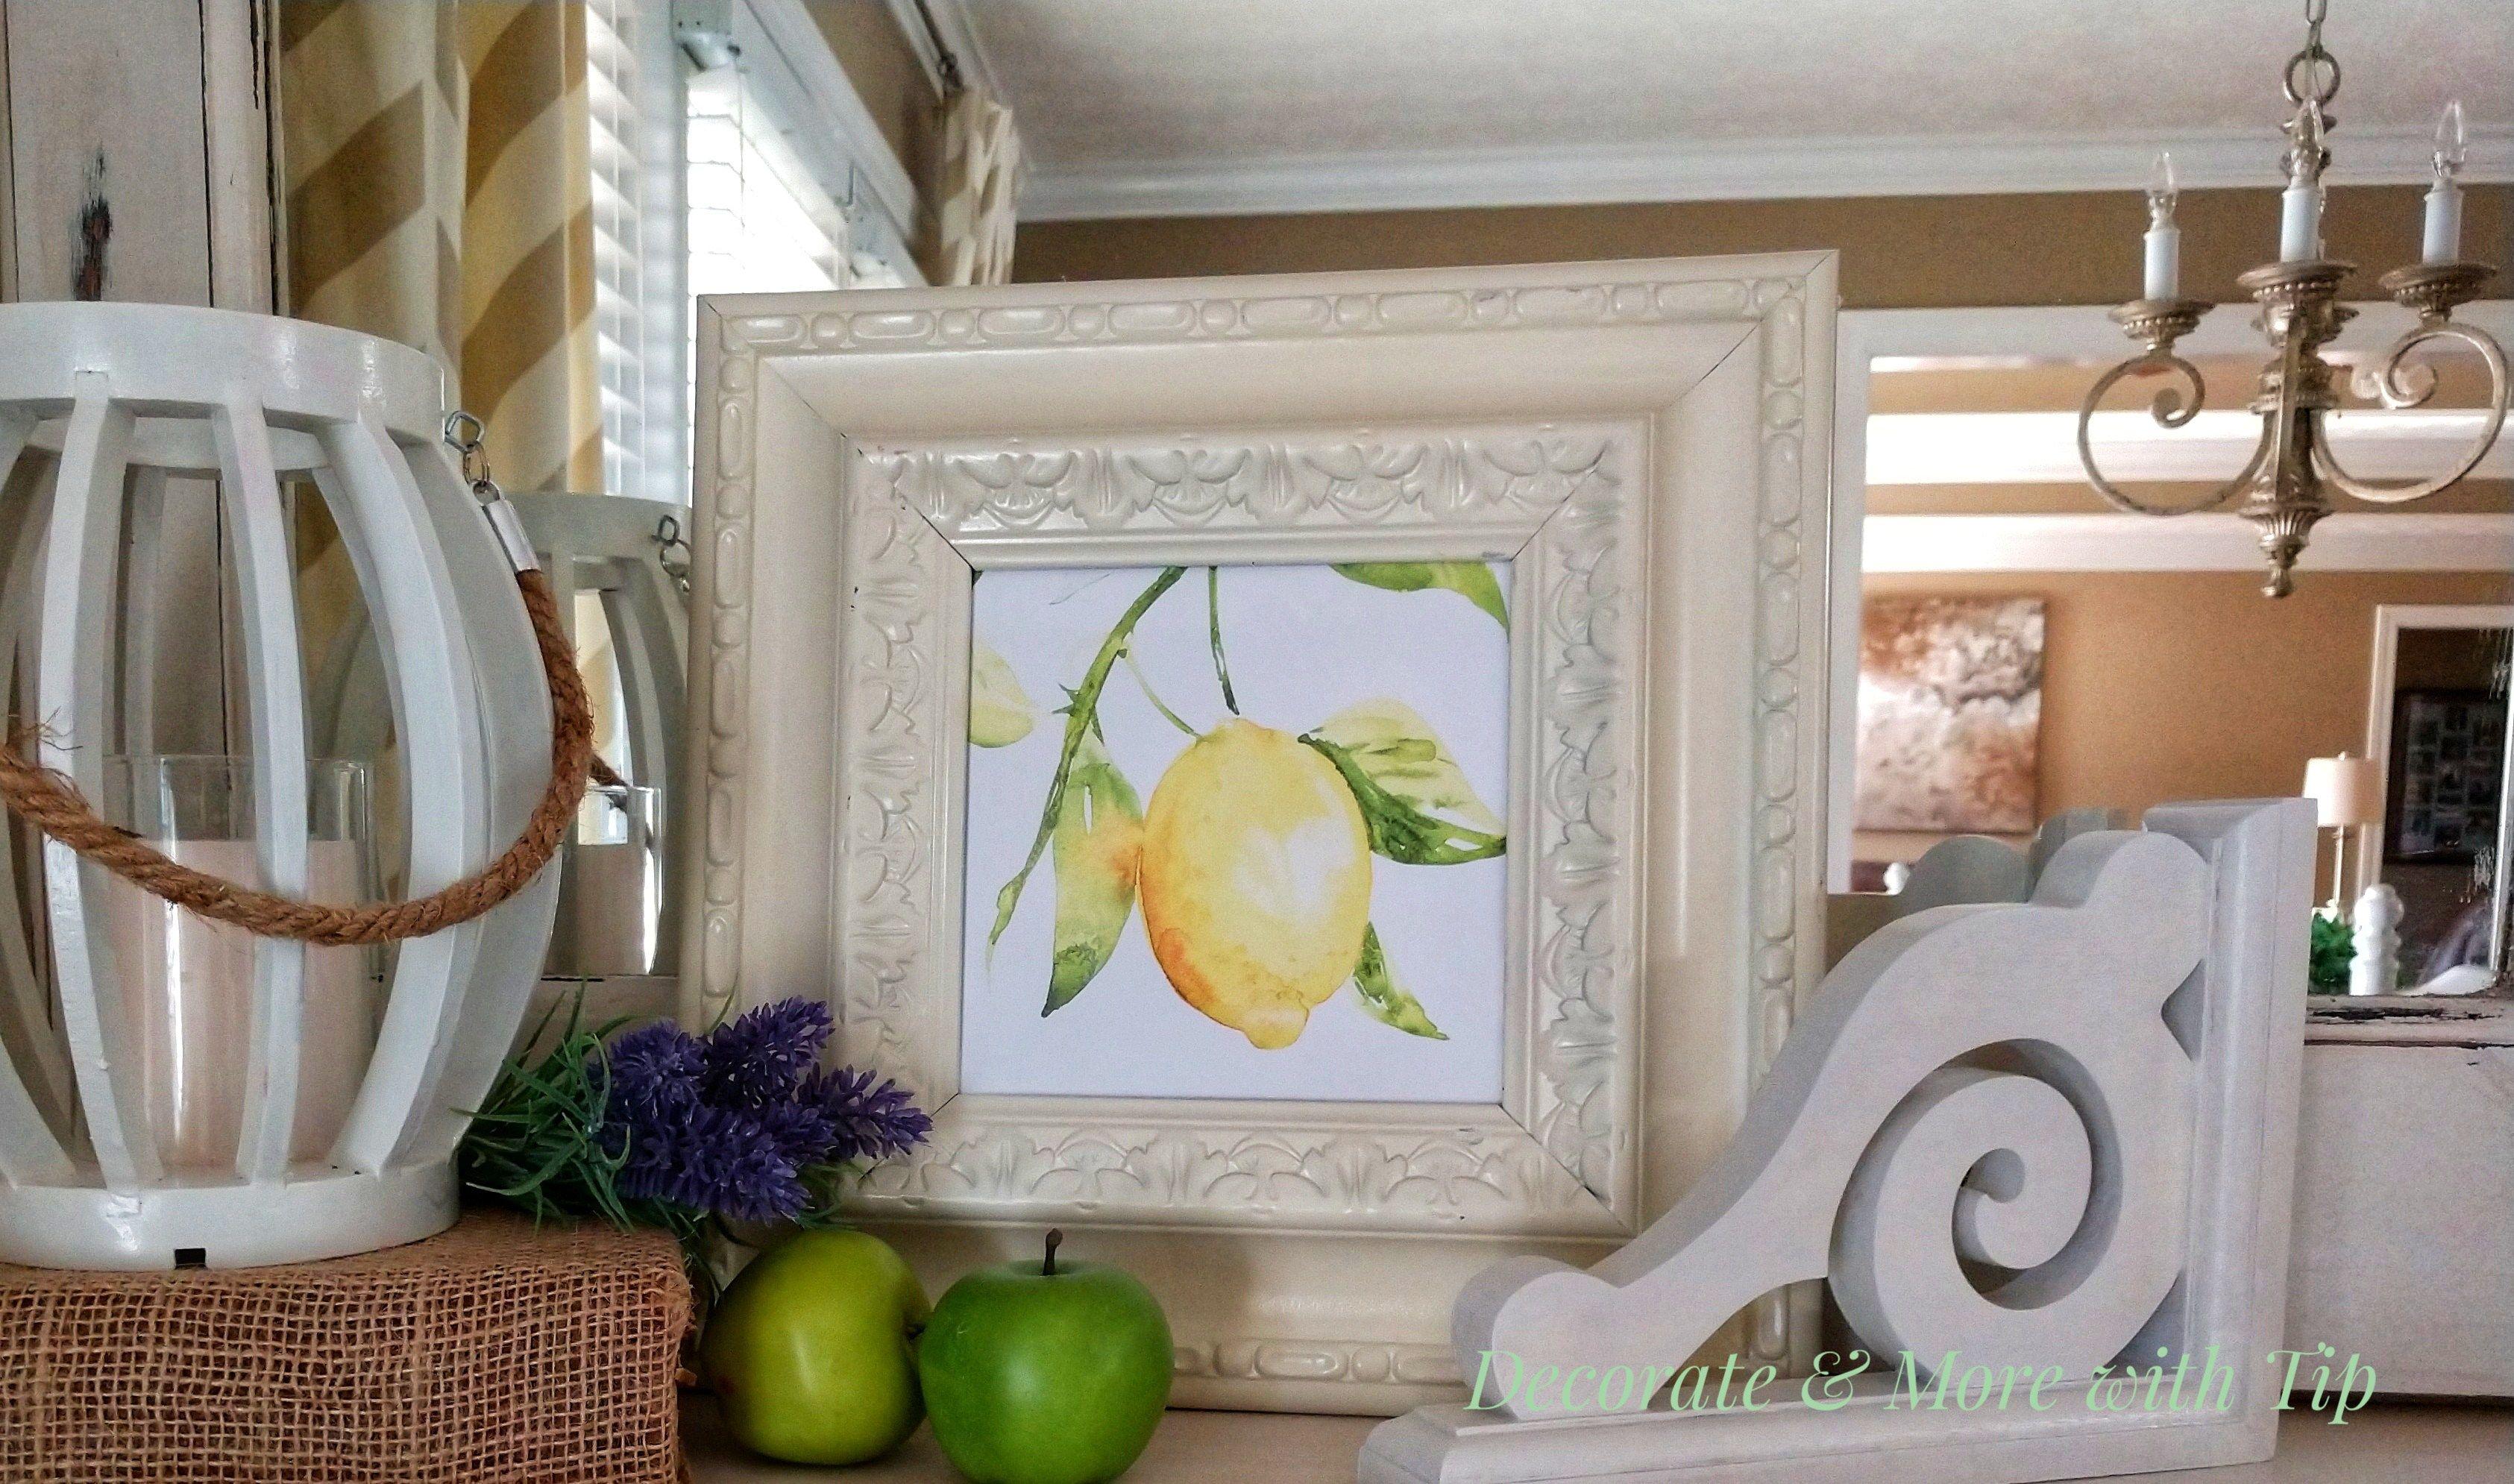 Remarkable Diy Lemon Dollar Tree Craft Inspiration Kitchen Kitchen Interior Design Ideas Helimdqseriescom